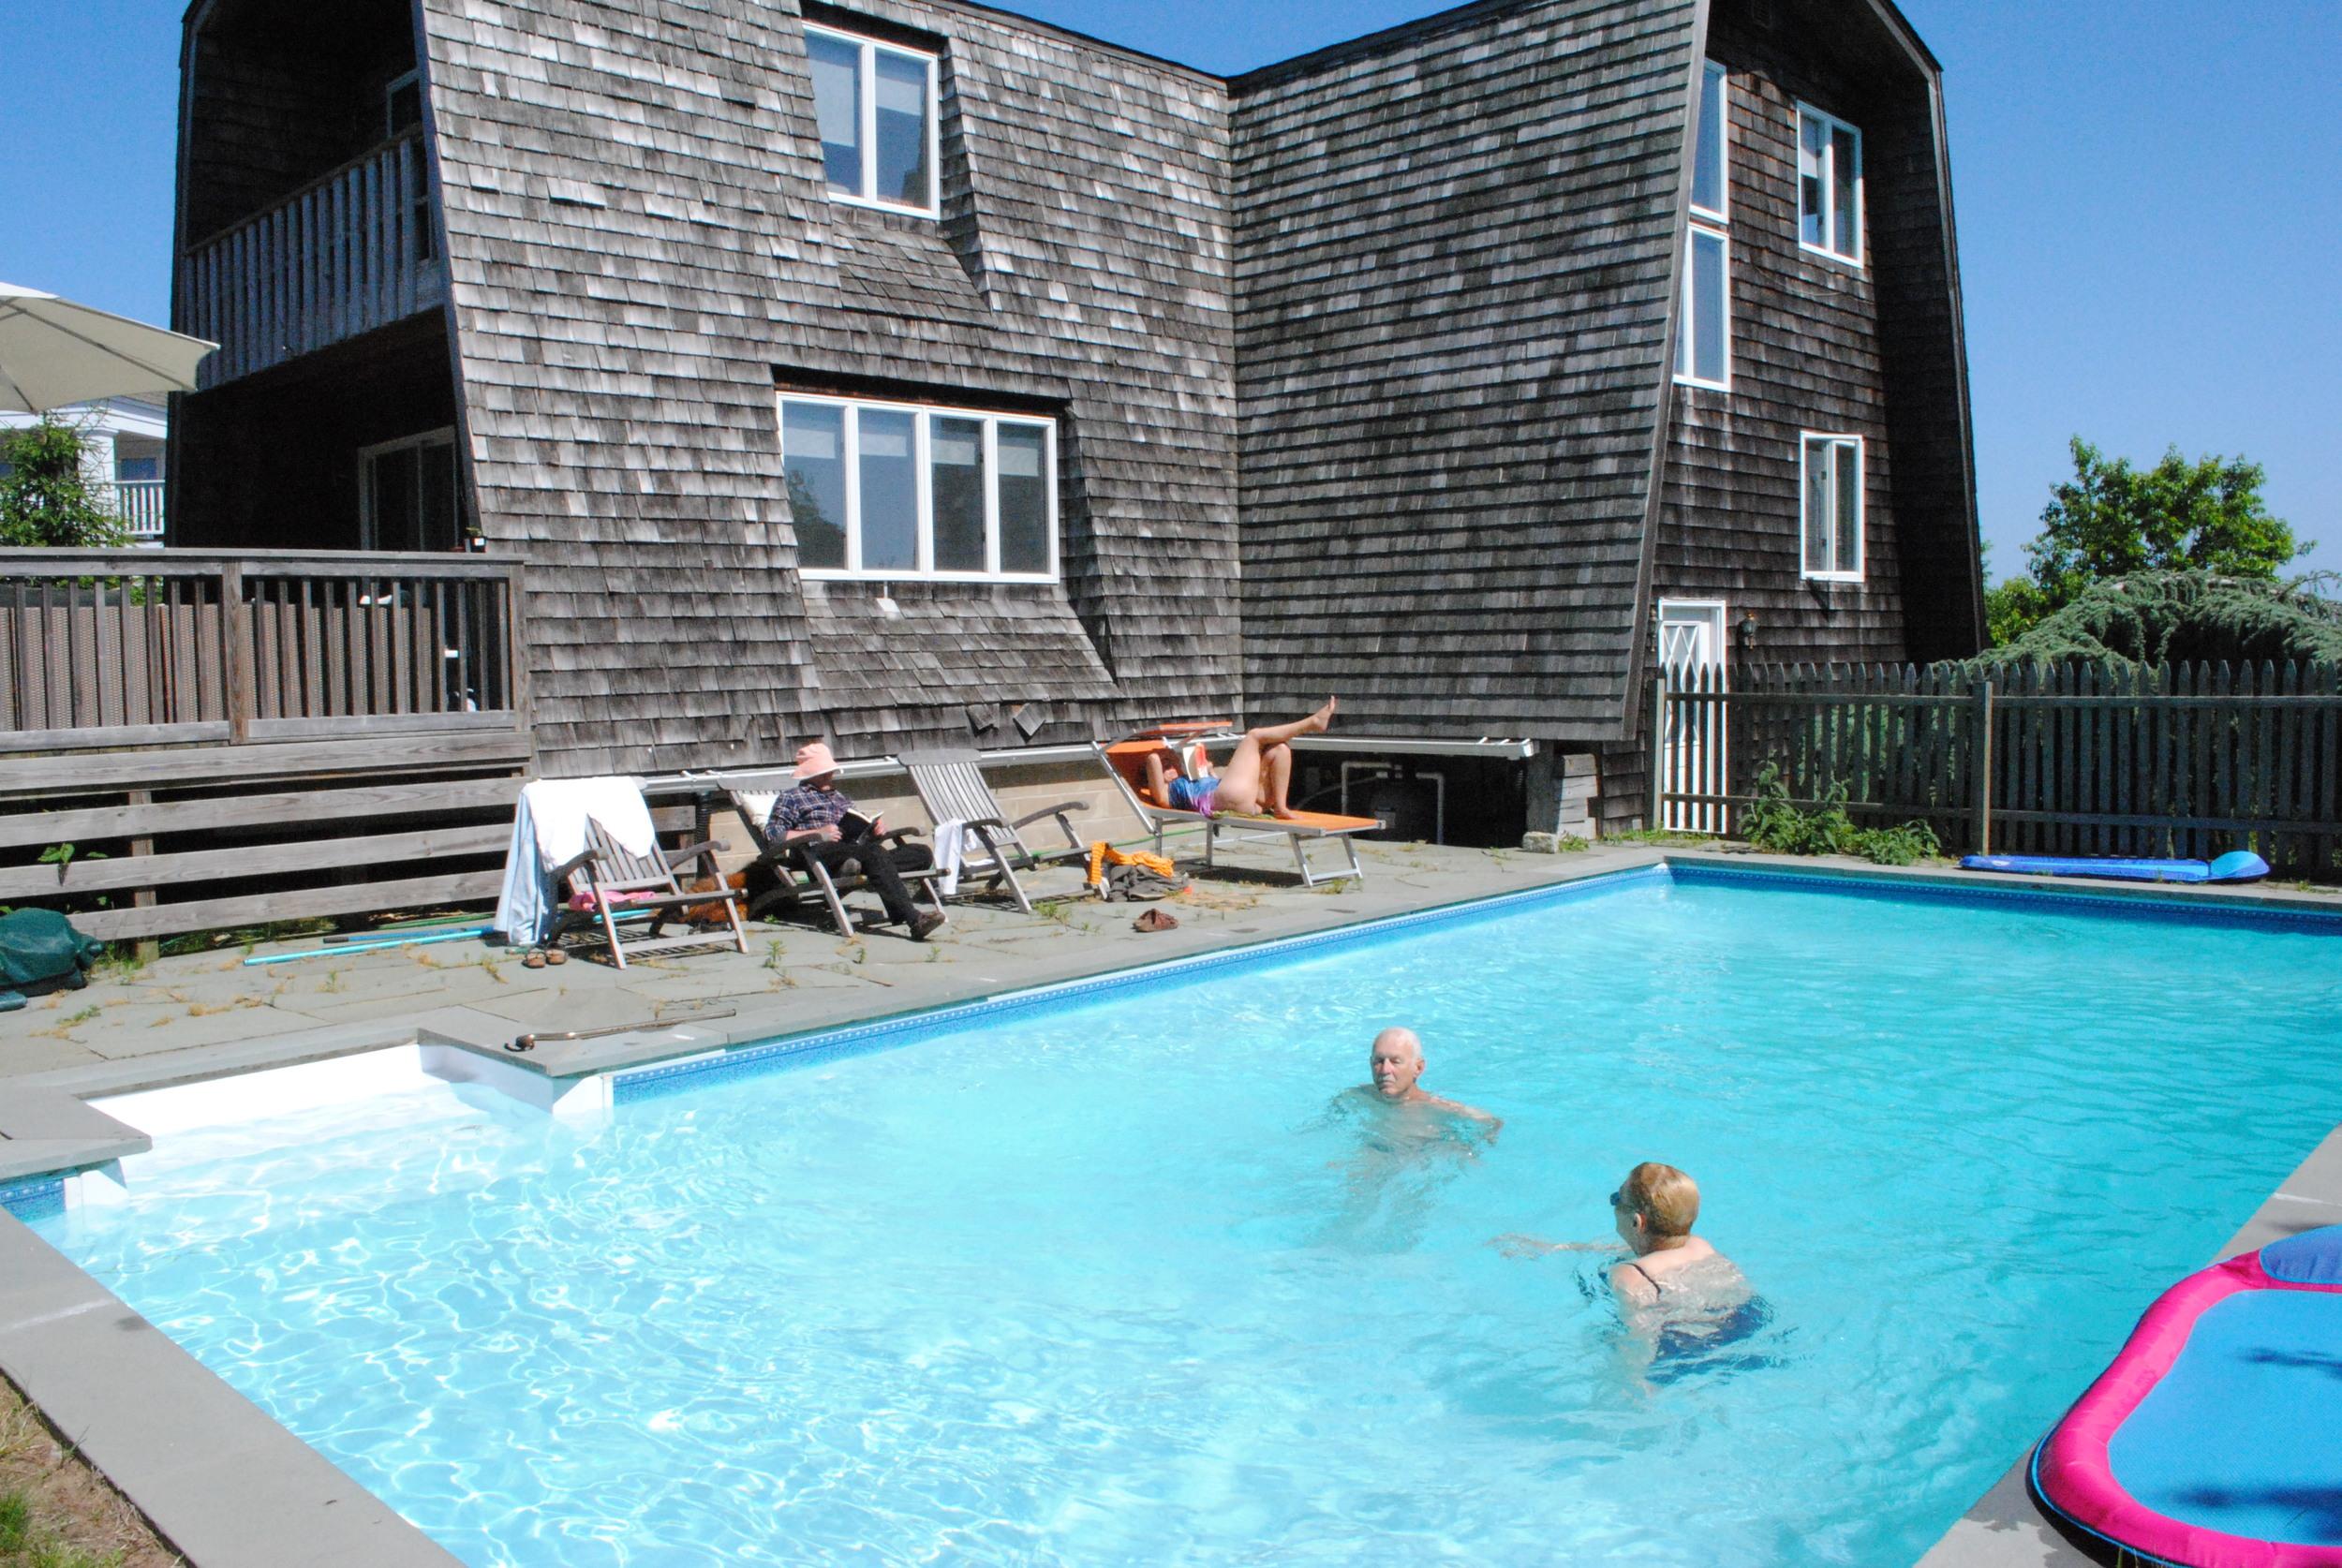 Grandparents Pool Time